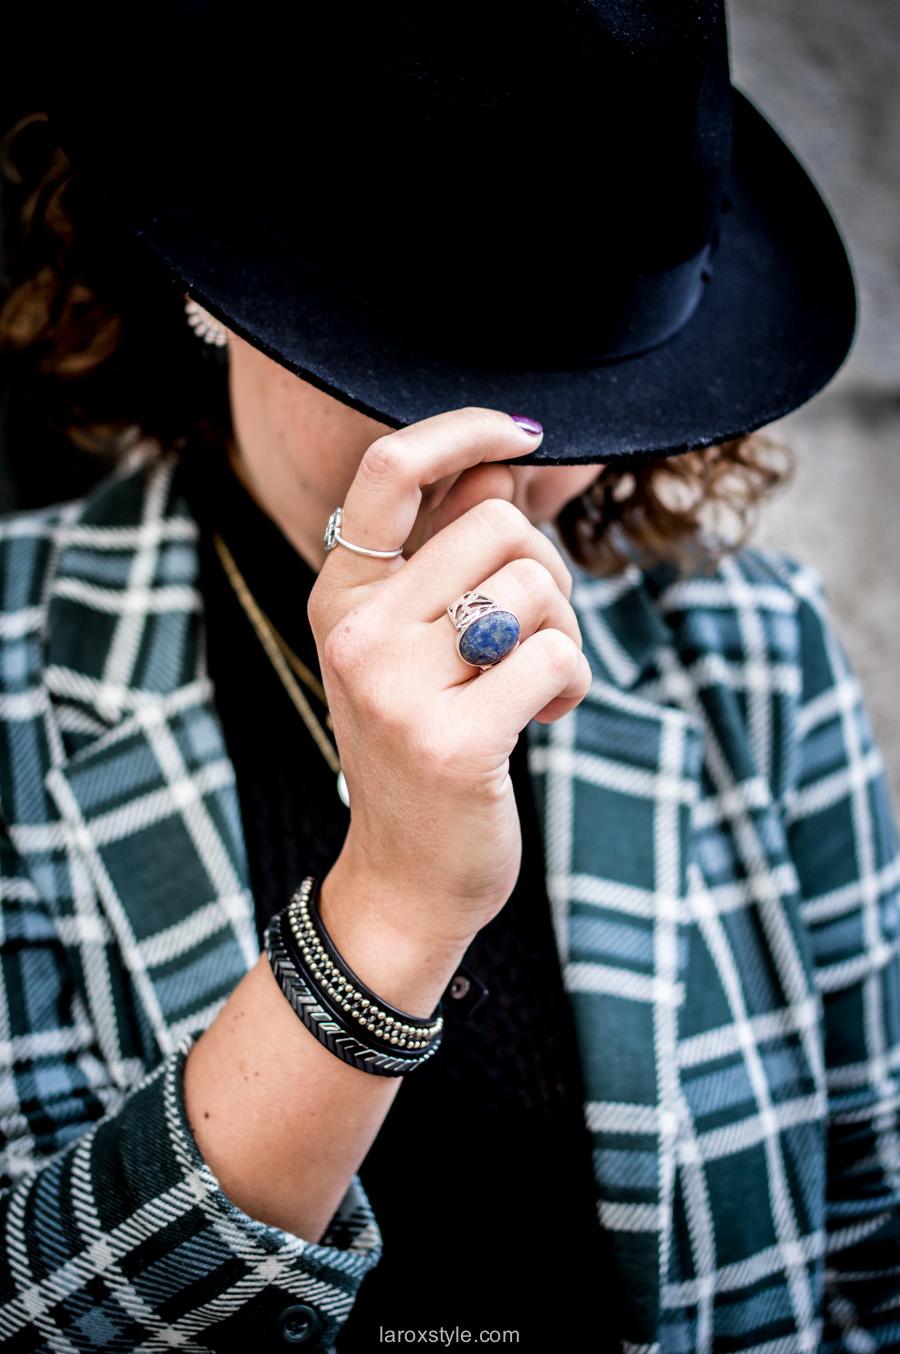 bristish style - veste a carreaux - - laroxstyle blog mode lyon